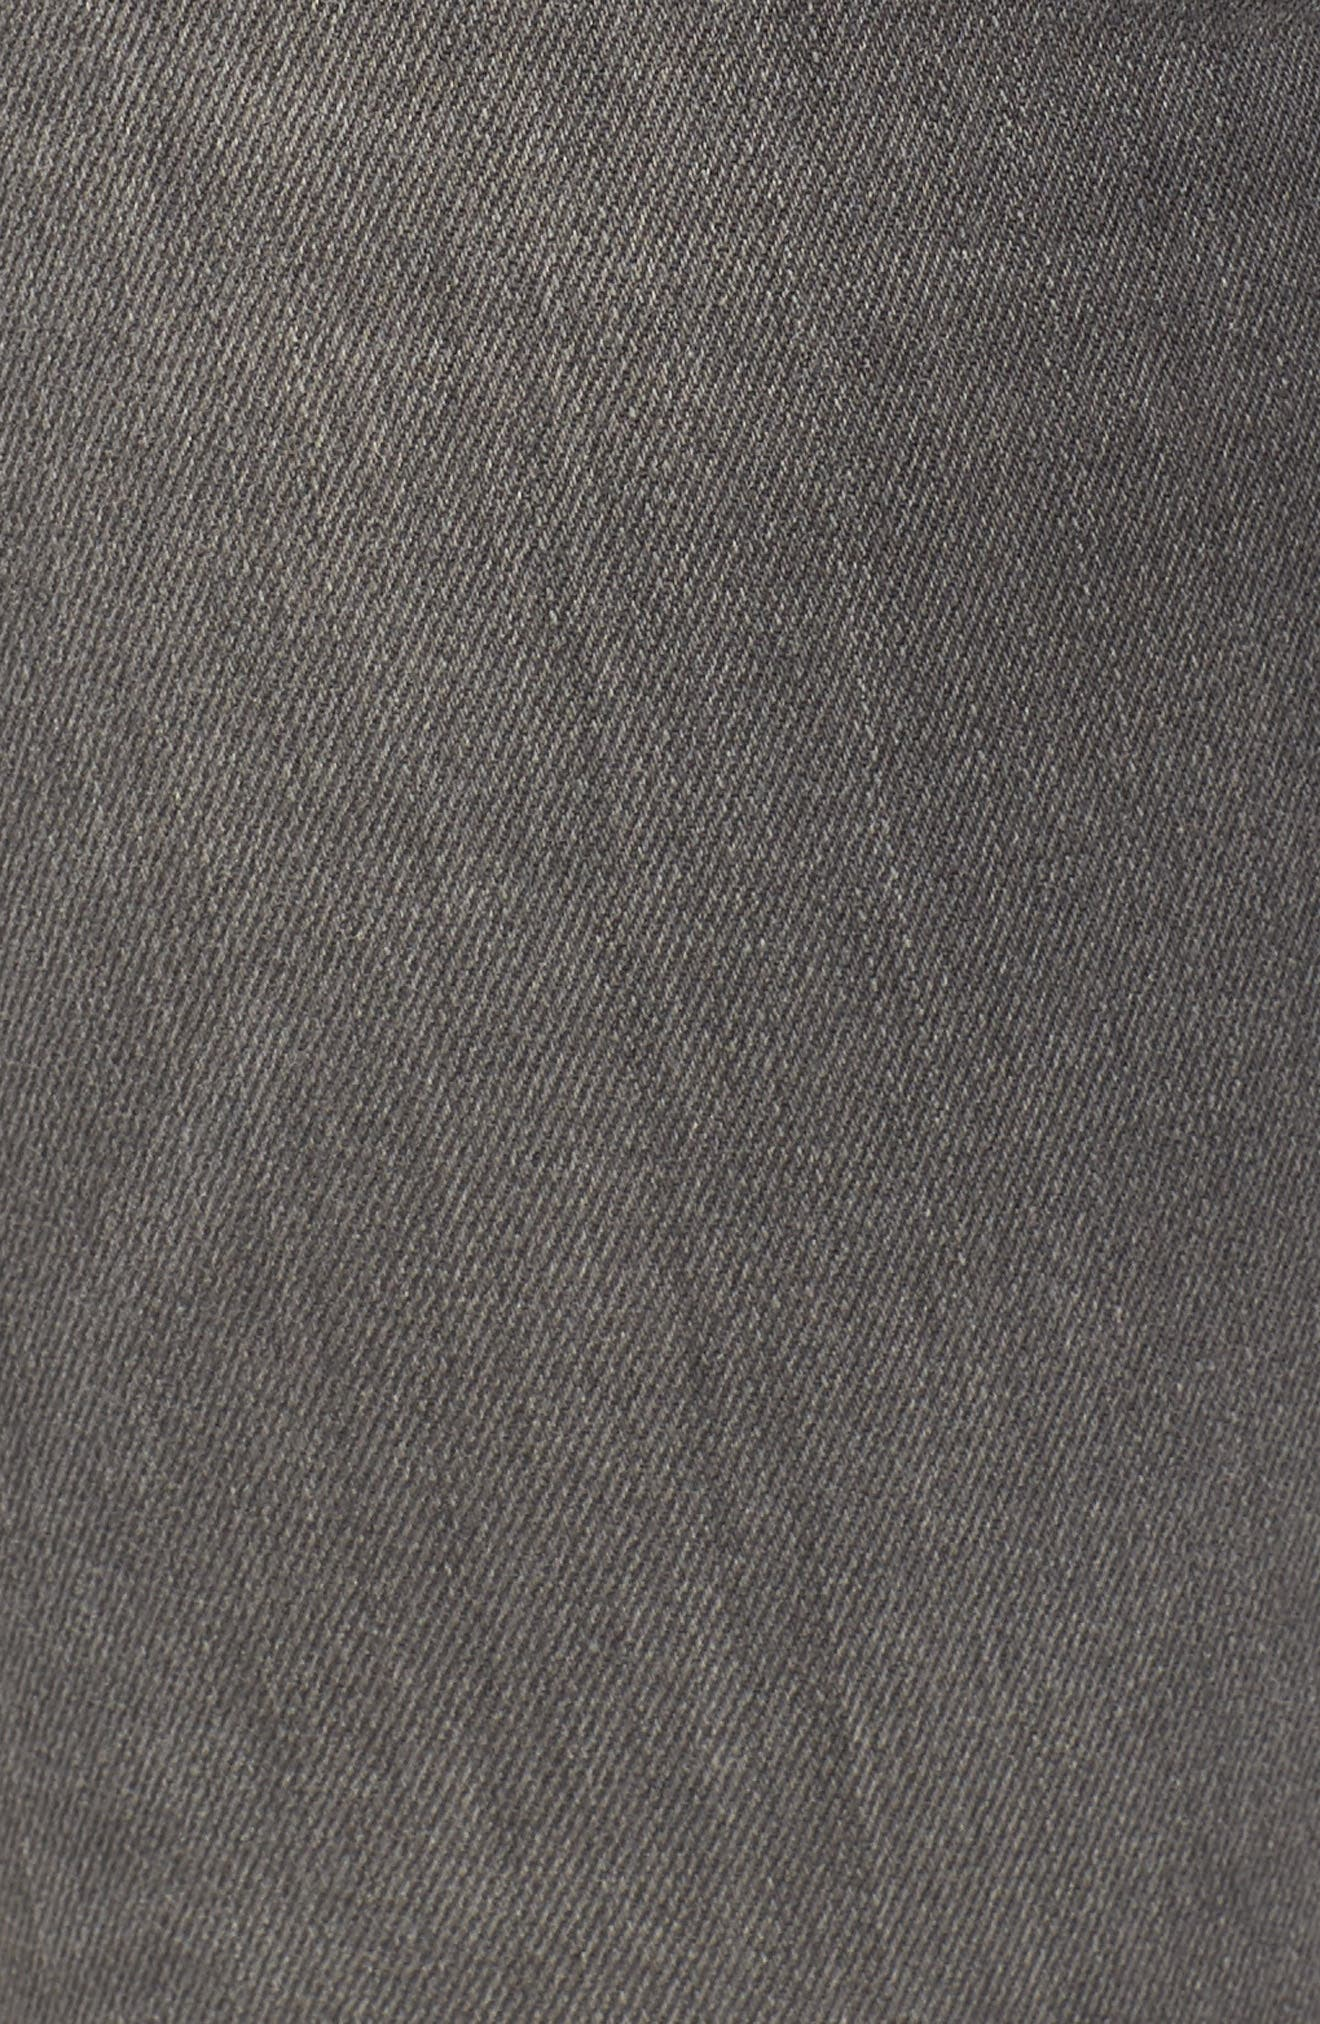 The Farrah High Waist Raw Hem Skinny Jeans,                             Alternate thumbnail 5, color,                             12 YEARS-SHADOW ASH